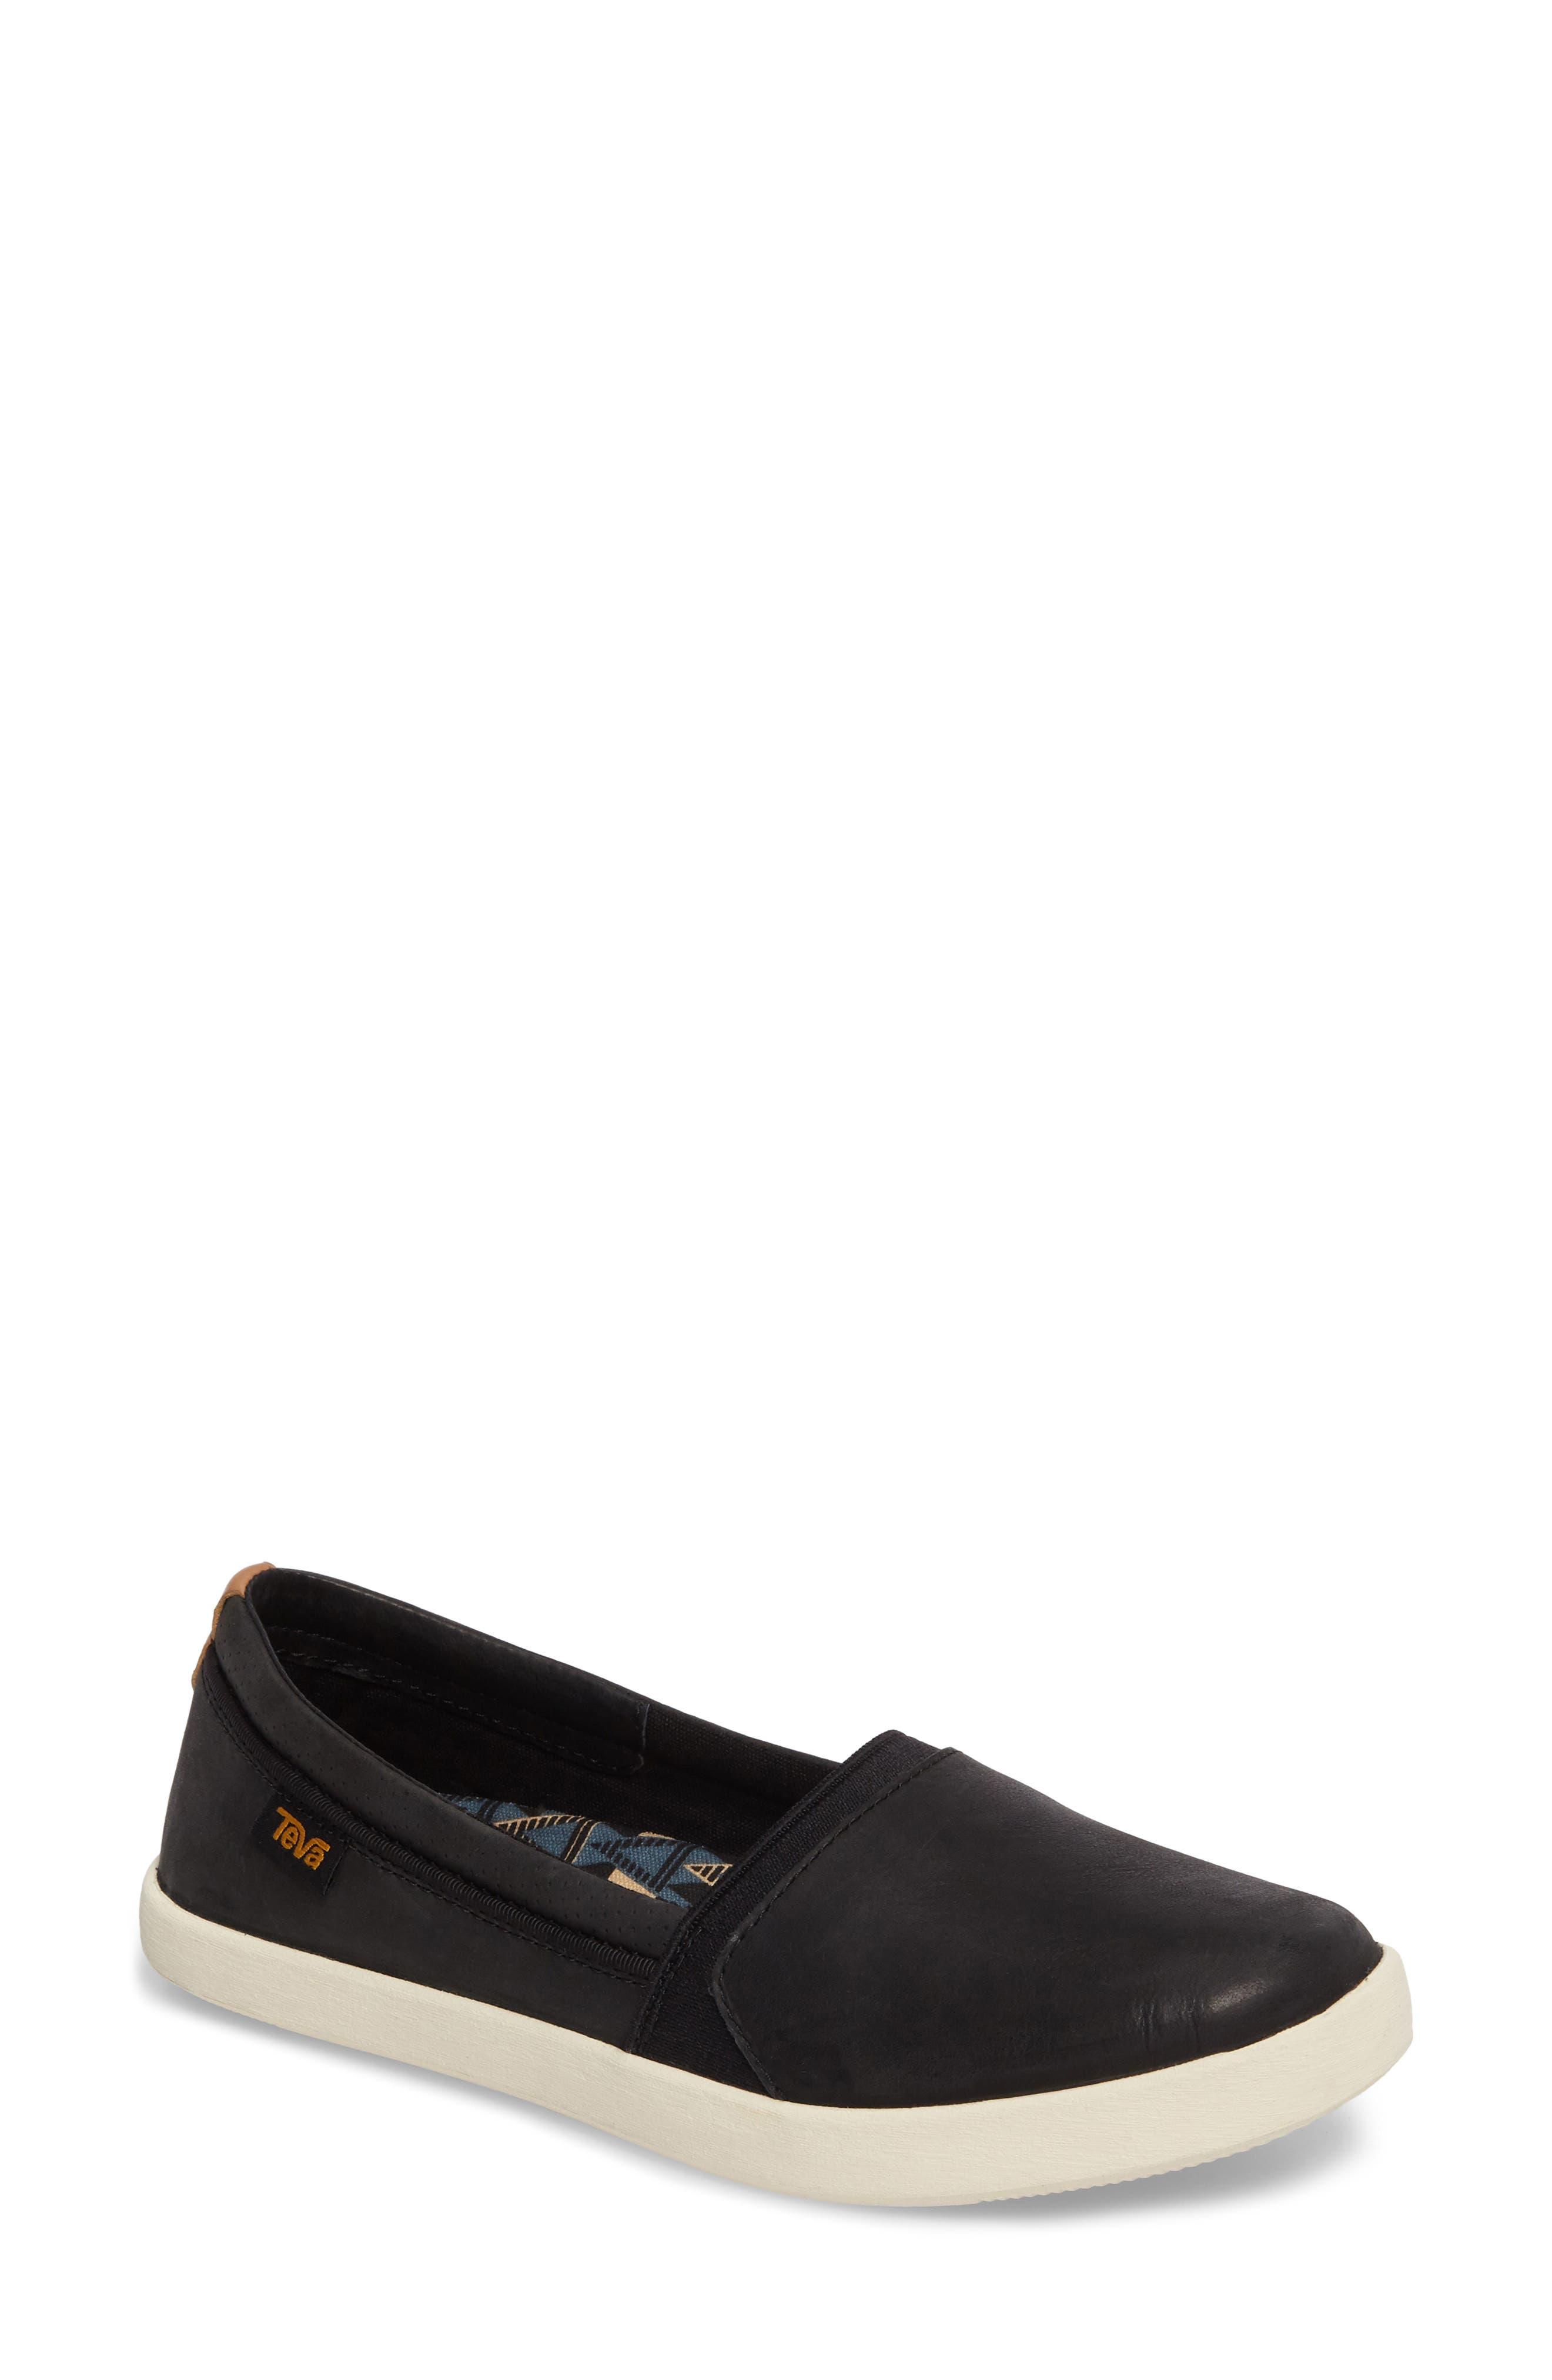 Willow Slip-On Sneaker,                         Main,                         color, 001